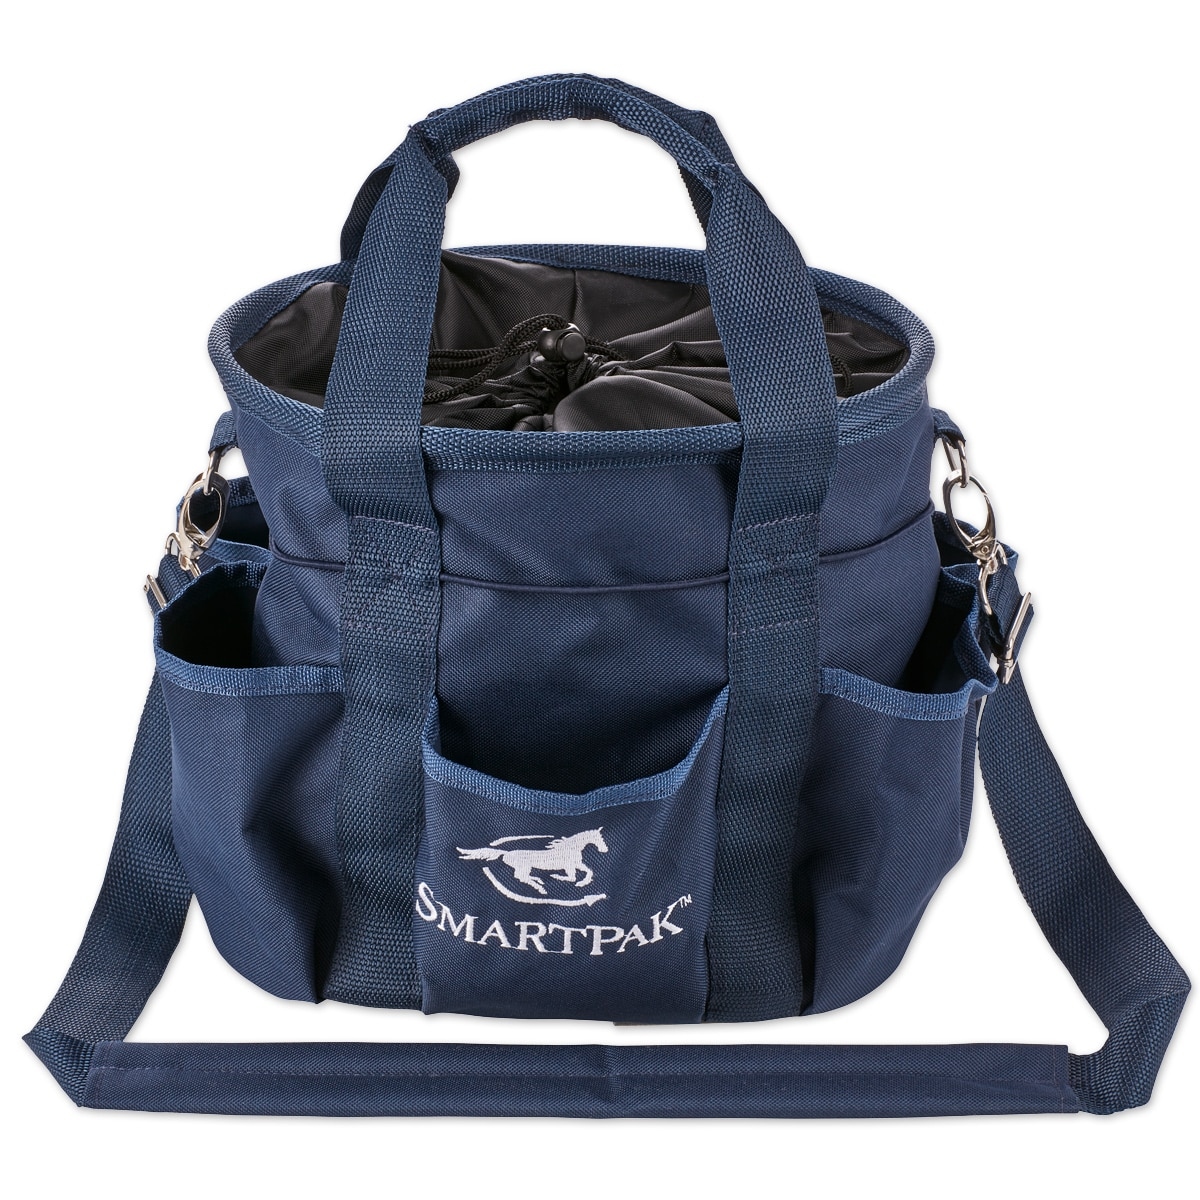 Horsegear Grooming Bag